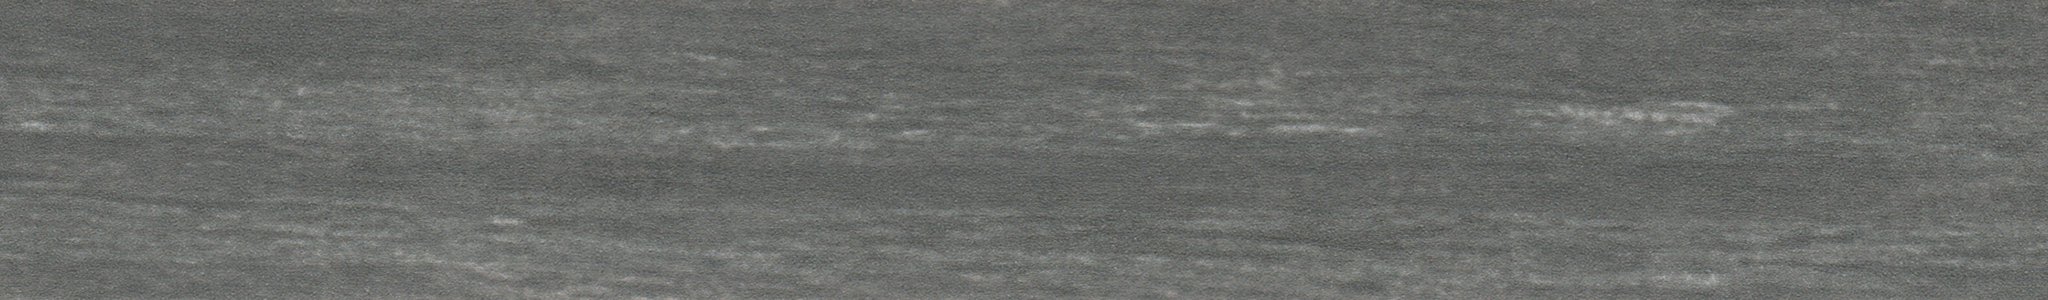 HD 298323 ABS Kante Dekor Dunkel Holz perl